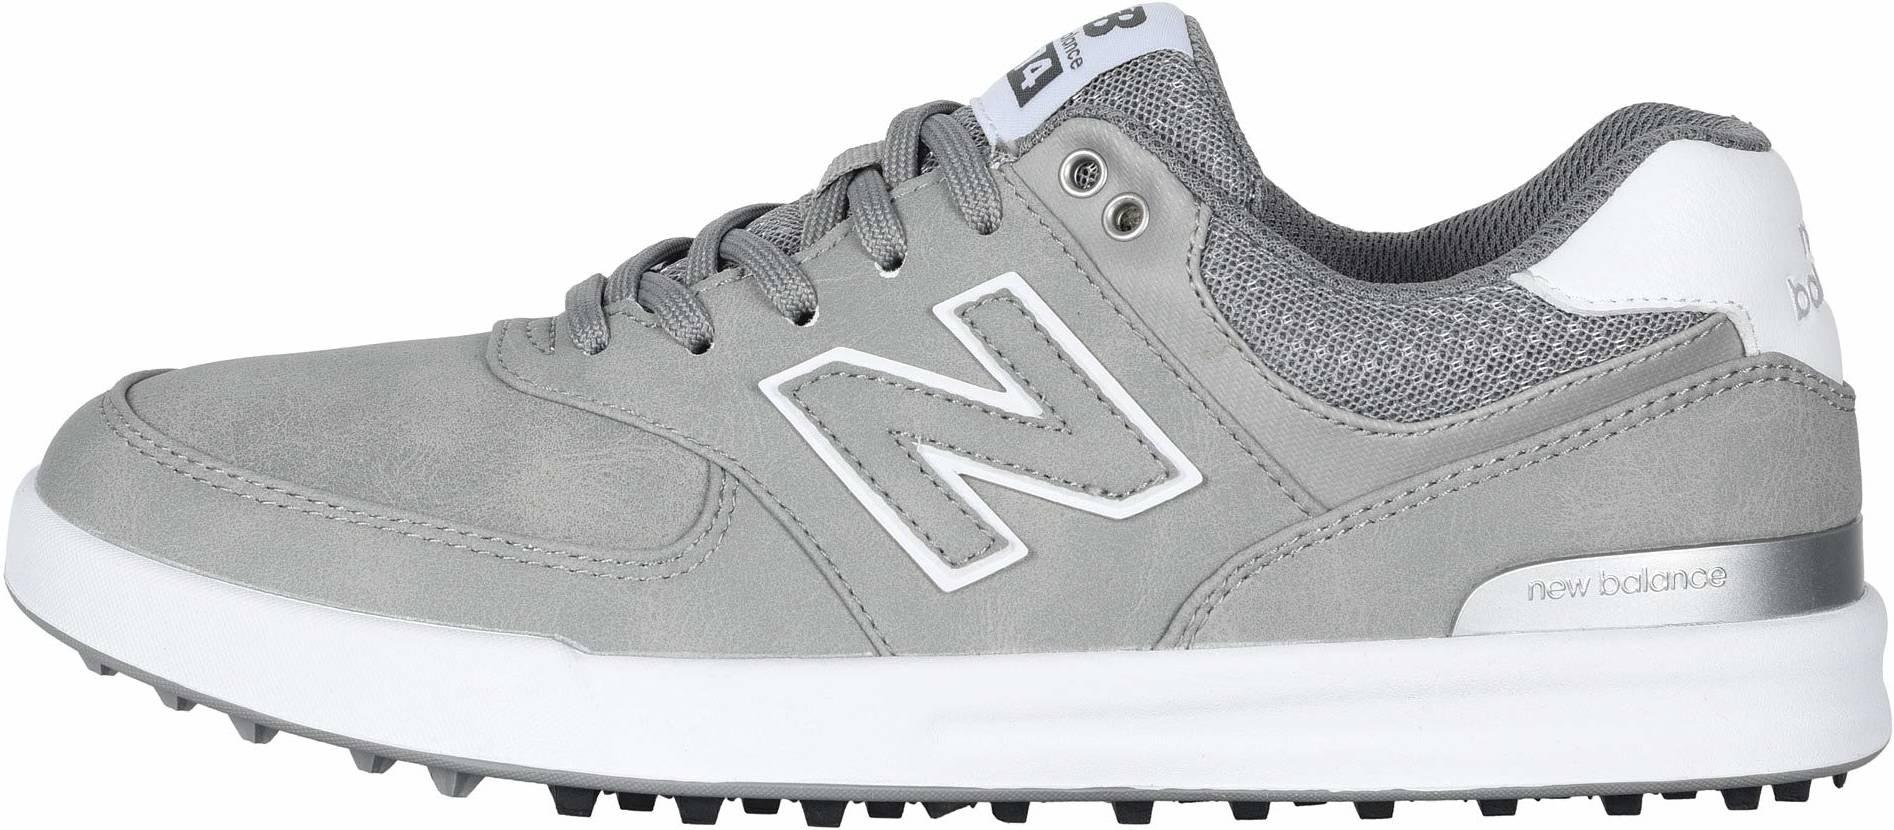 new balance grise 574